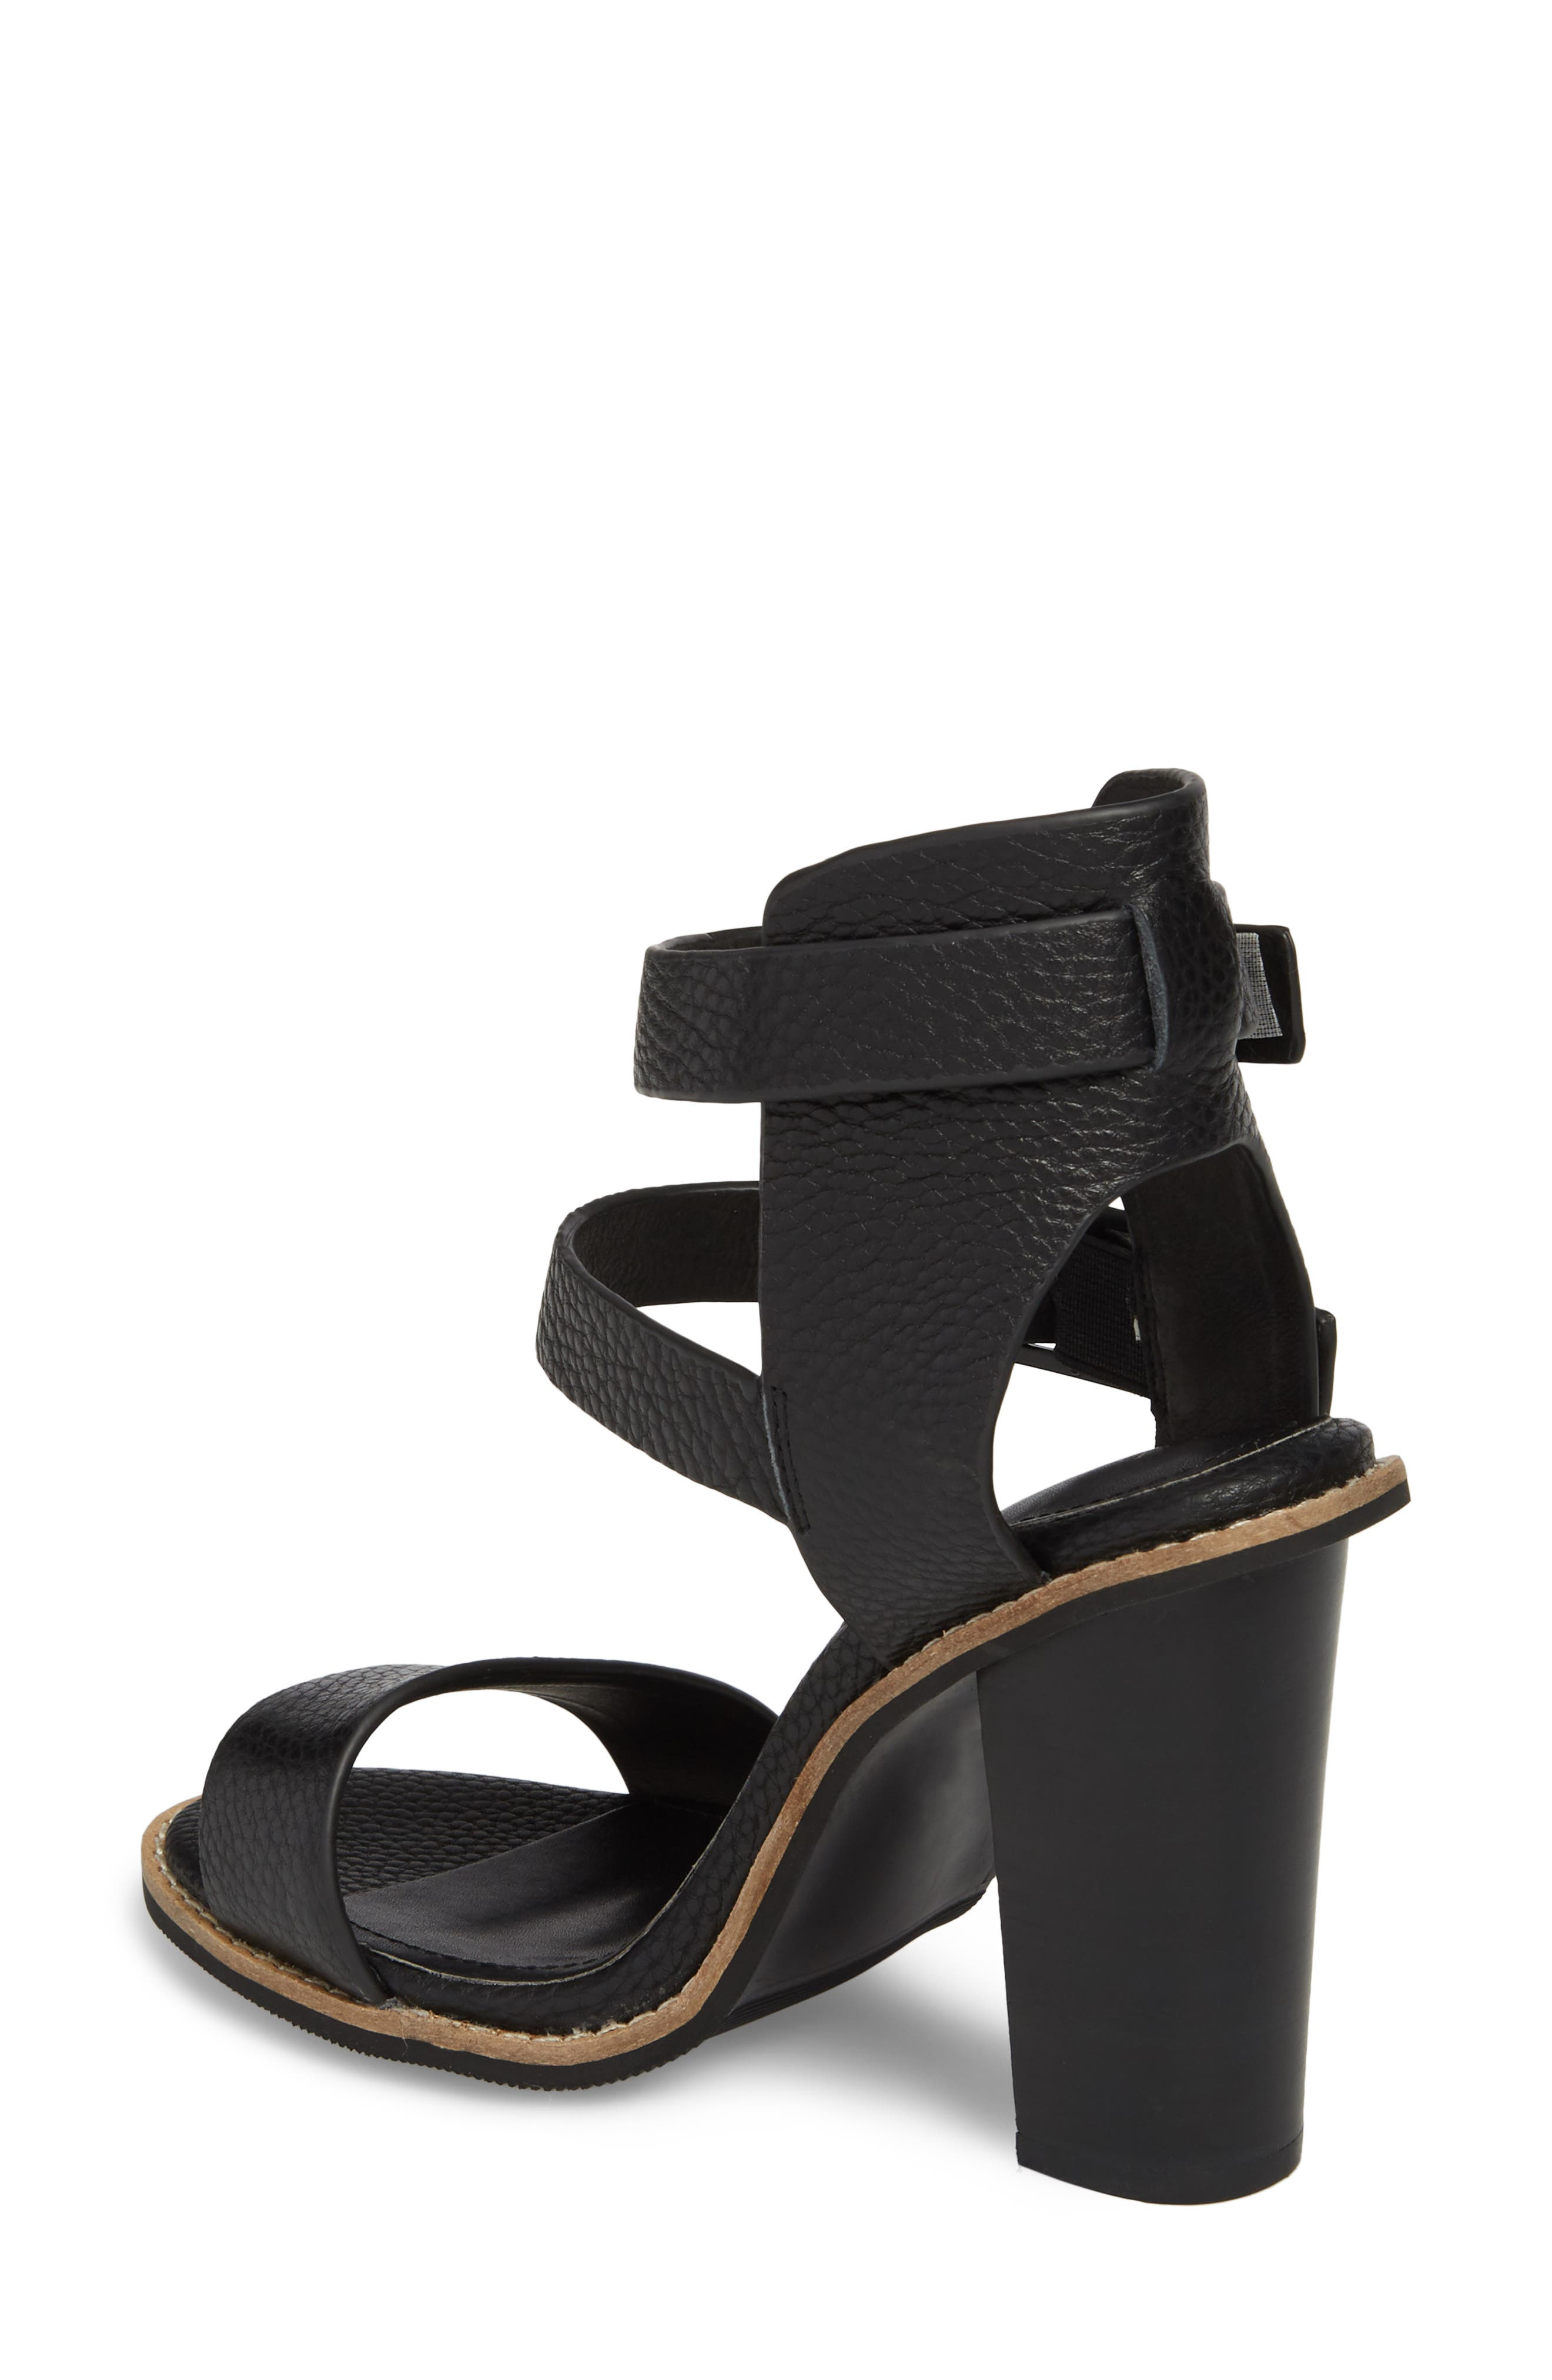 Casper Tall Sandal,                             Alternate thumbnail 2, color,                             Black Leather